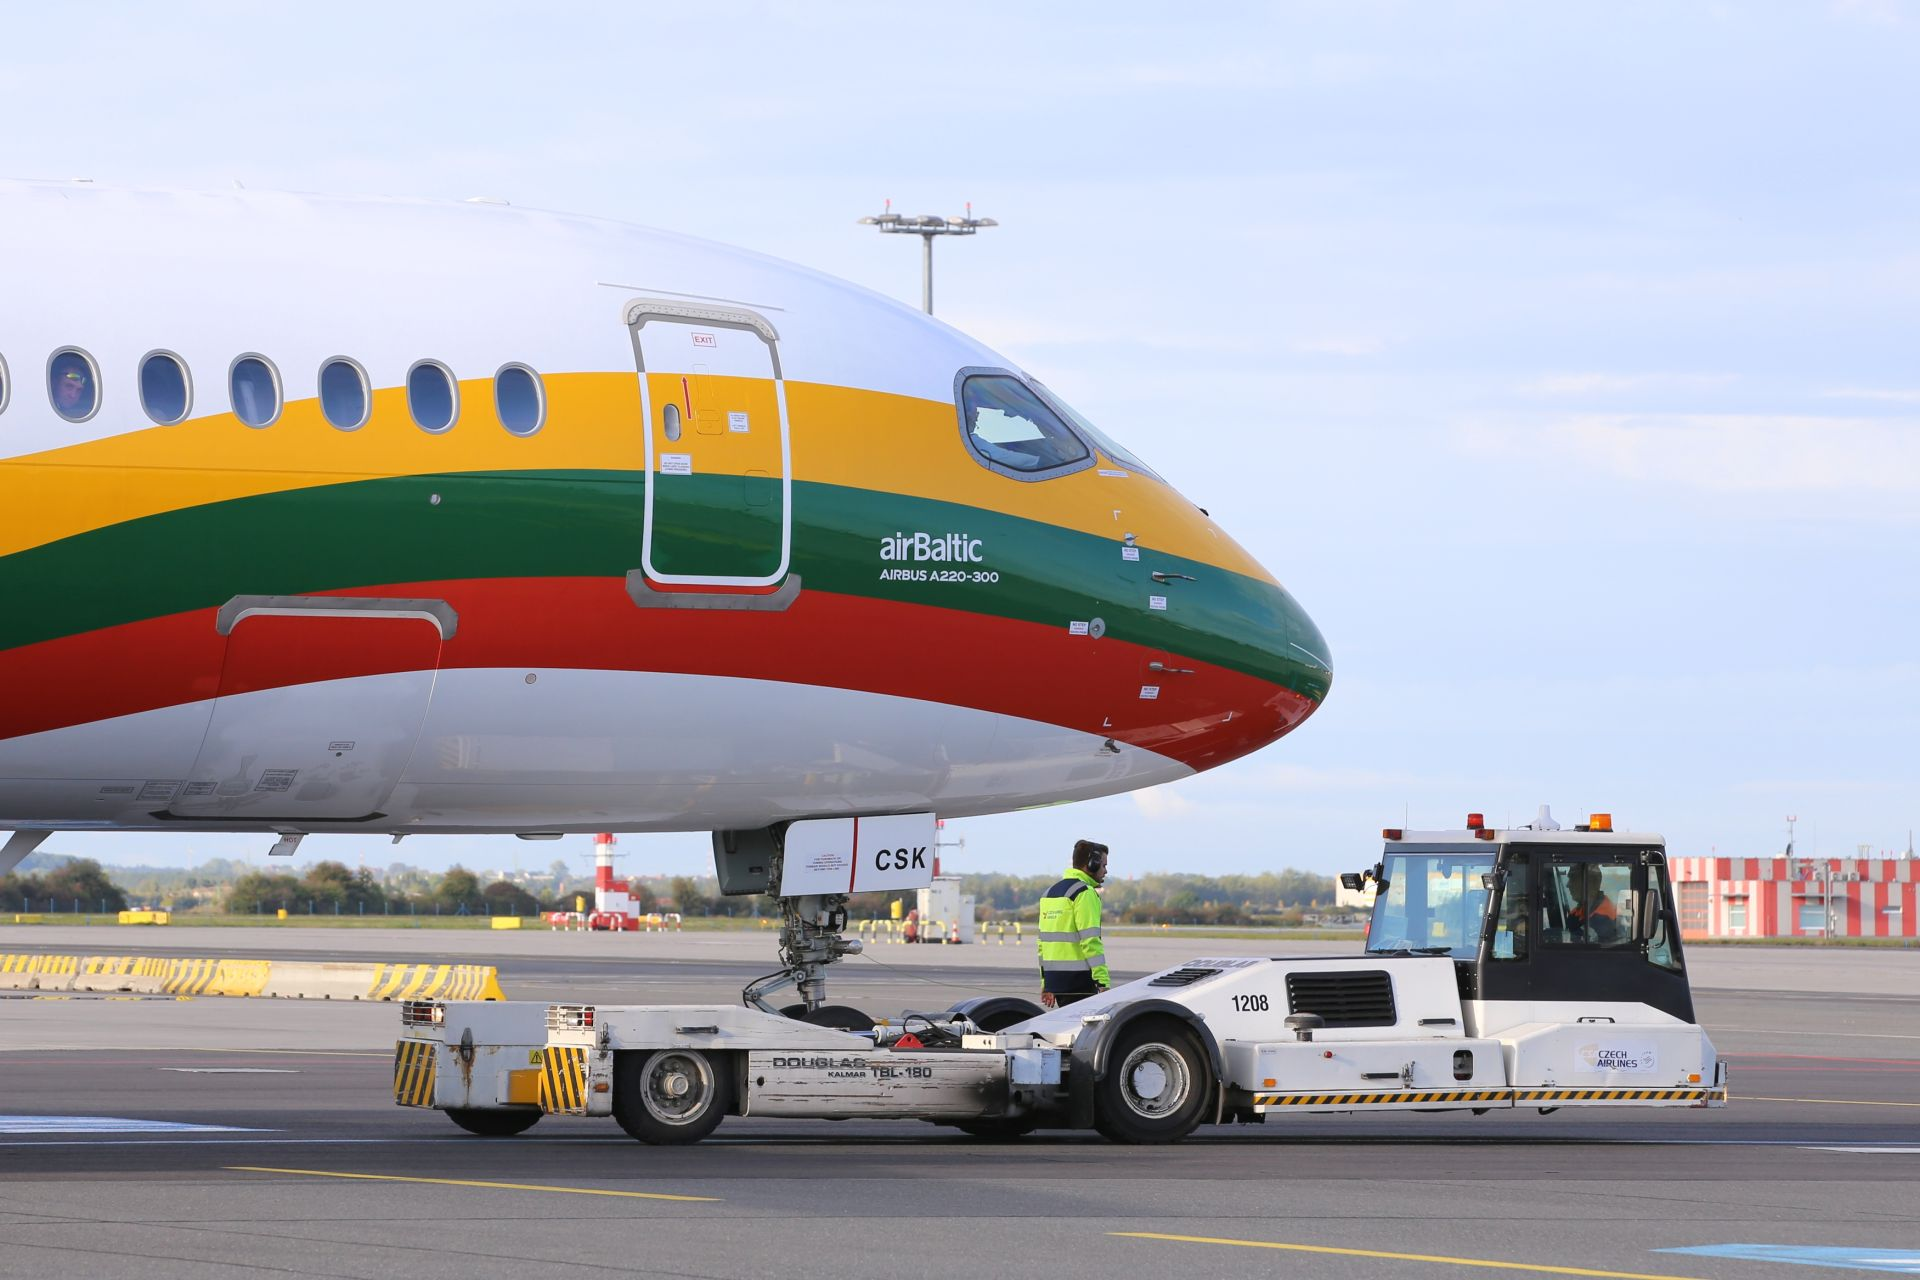 Airbus A220-300 společnosti airBaltic v barvách litevské vlajky v Praze. Foto: Letiště Praha